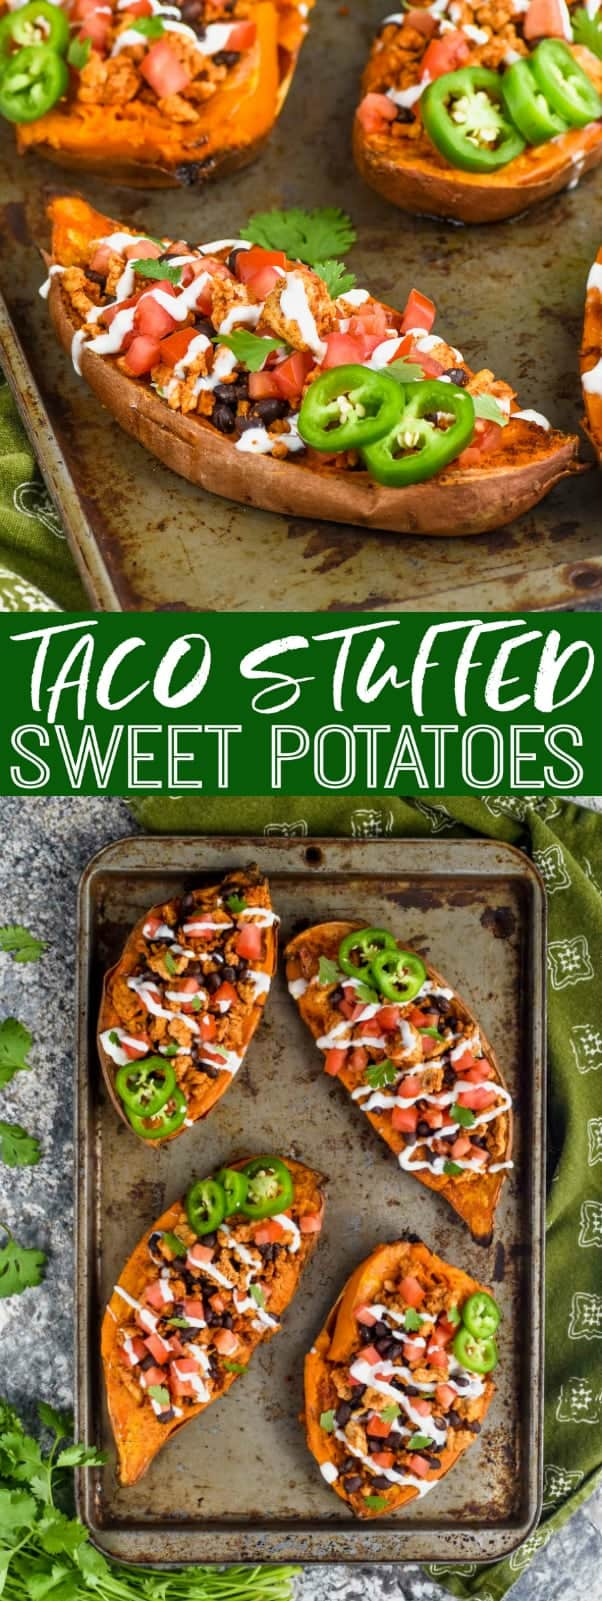 taco stuffed sweet potatoes recipe on a baking sheet